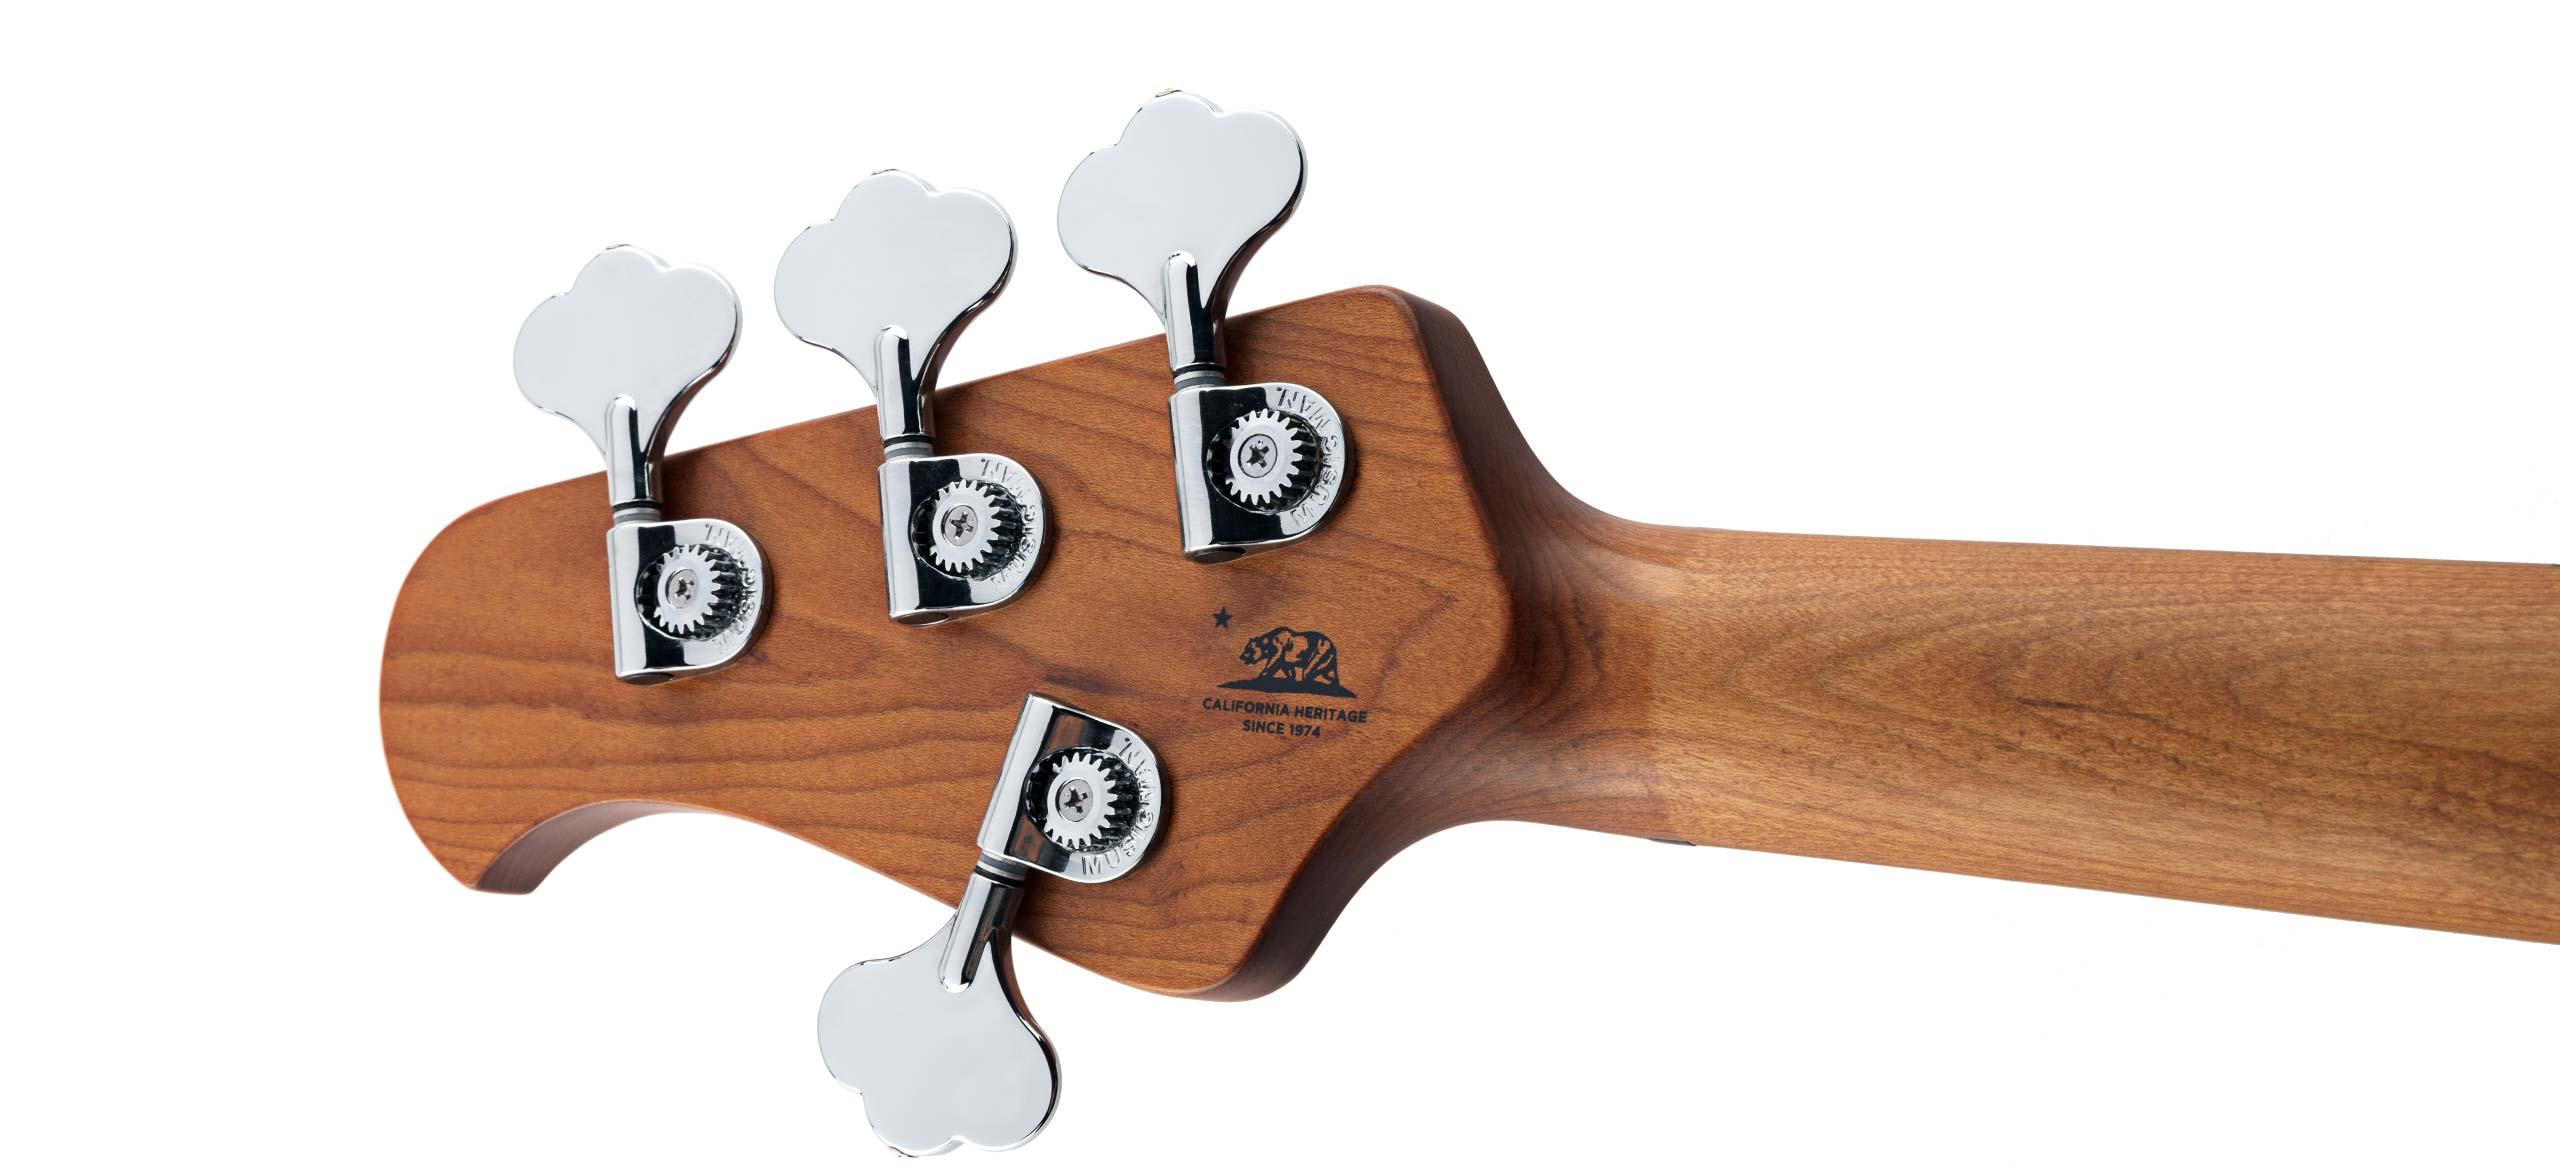 stingray special basses ernie ball music man. Black Bedroom Furniture Sets. Home Design Ideas